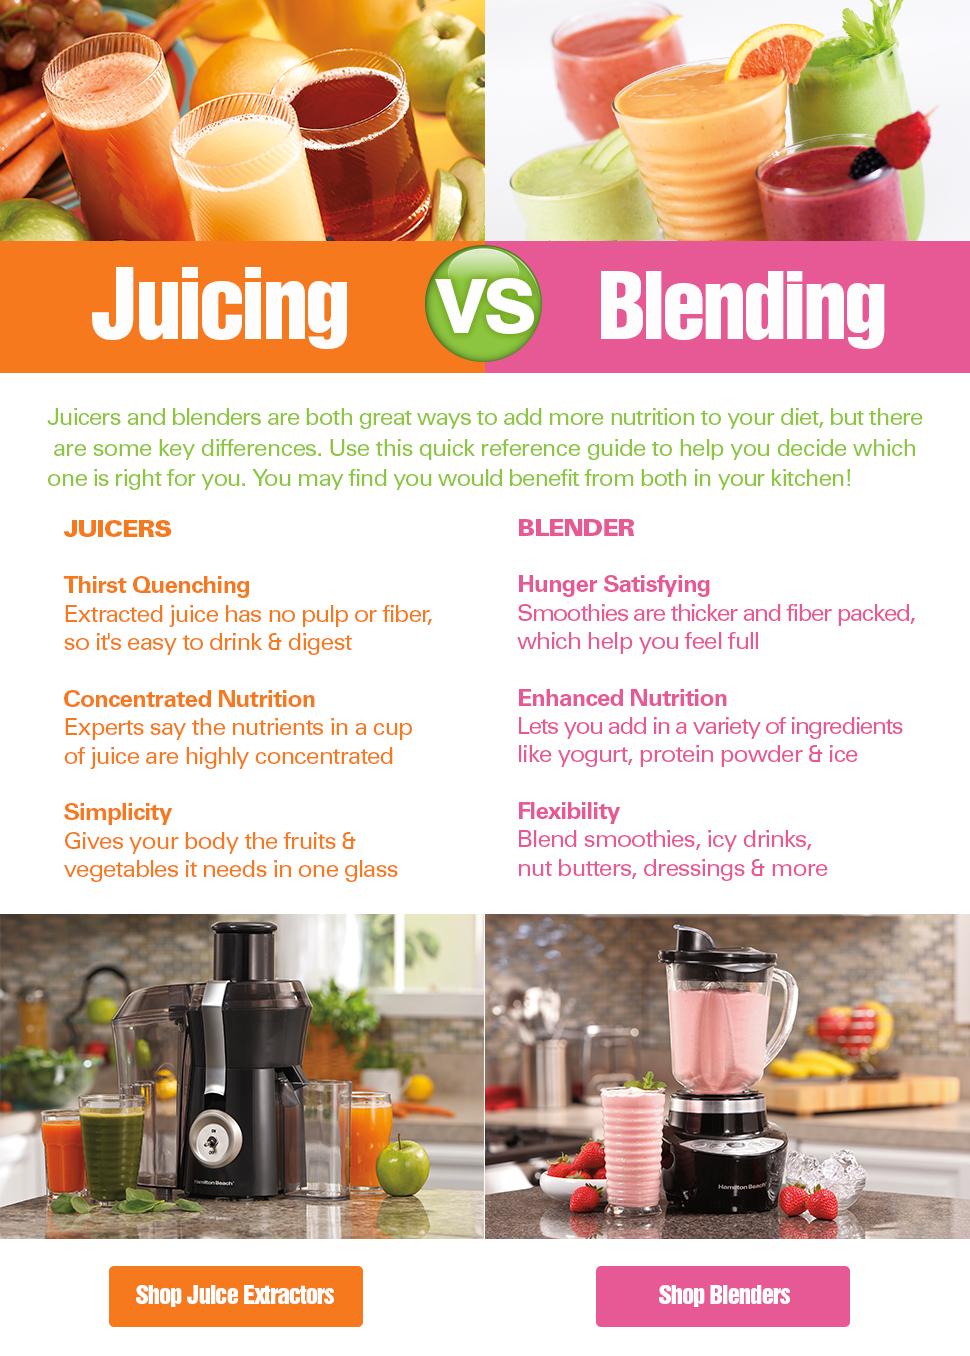 juicing-vs-blending-title-image.jpg